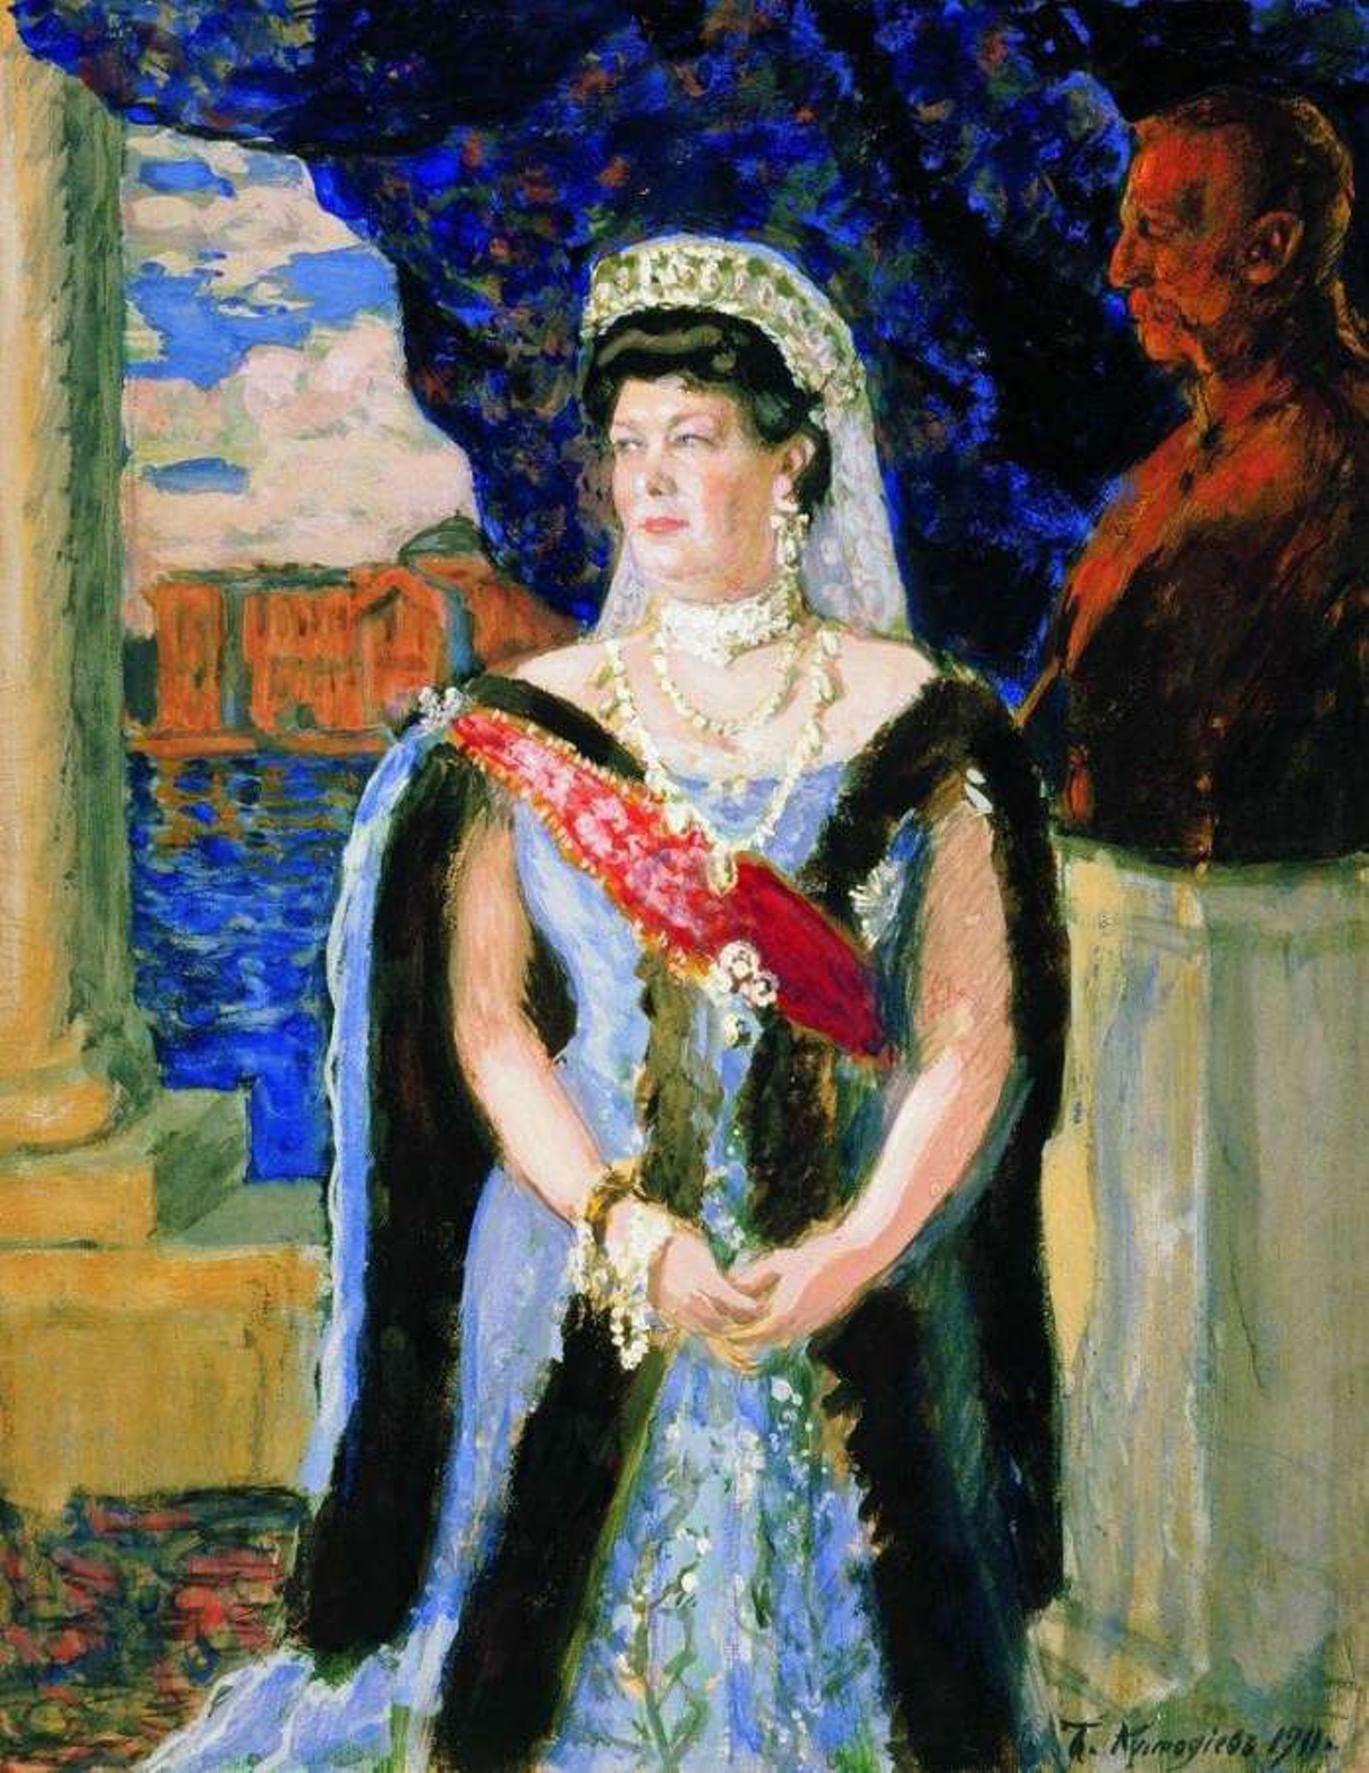 Драгоценности императриц от Рокотова до Кустодиева. Галерея 4. Мария Павловна